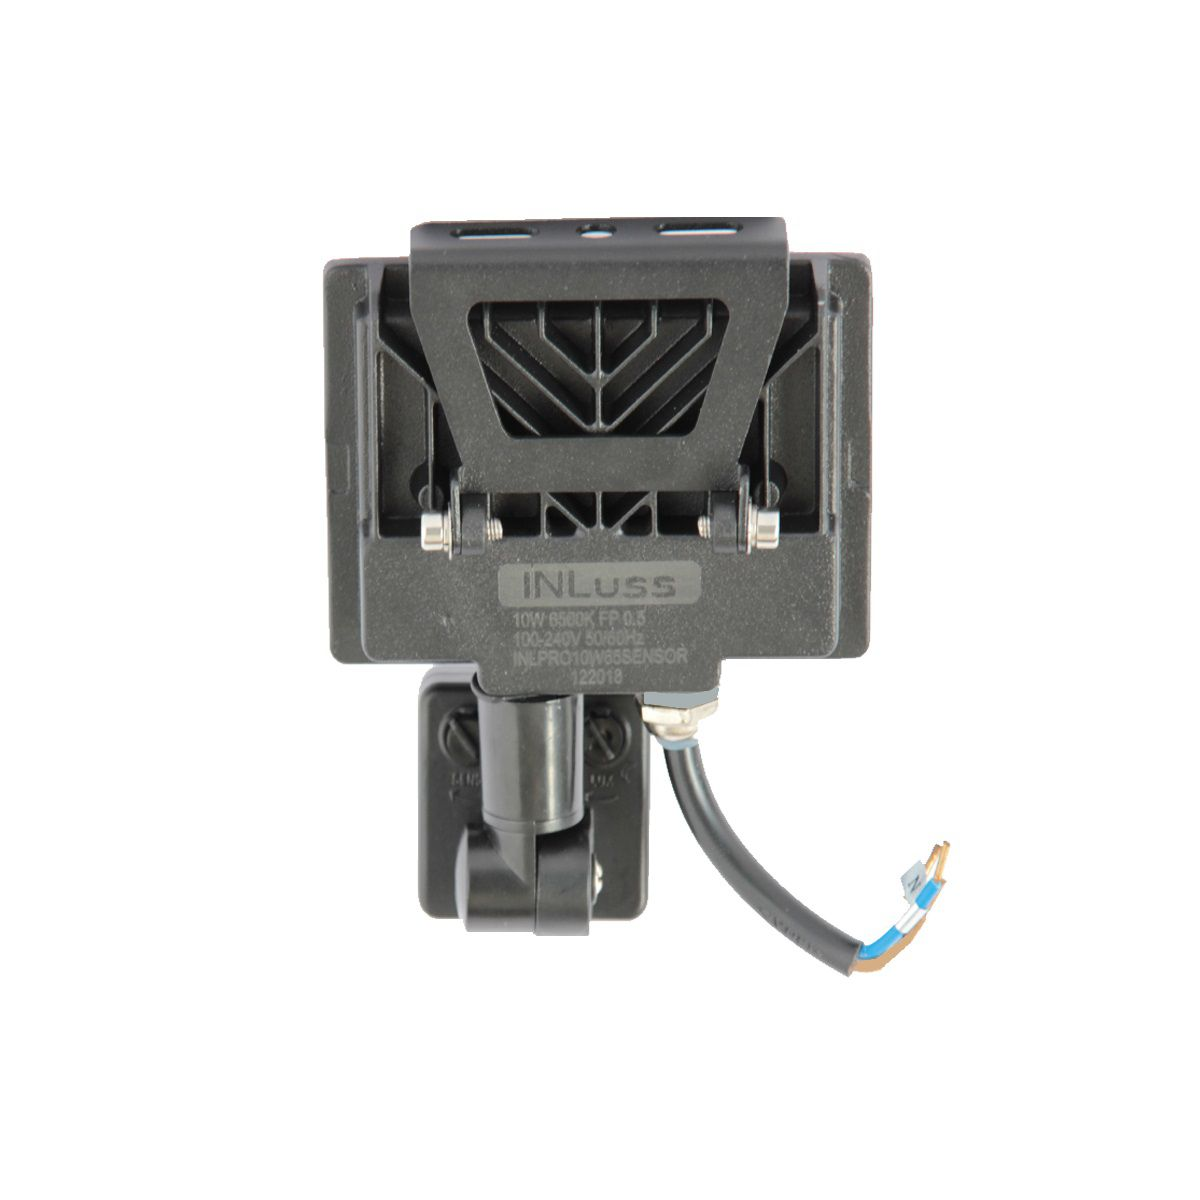 Kit 2 Projetor Led Super Slim 10W Com Sensor Branco Frio Bivolt